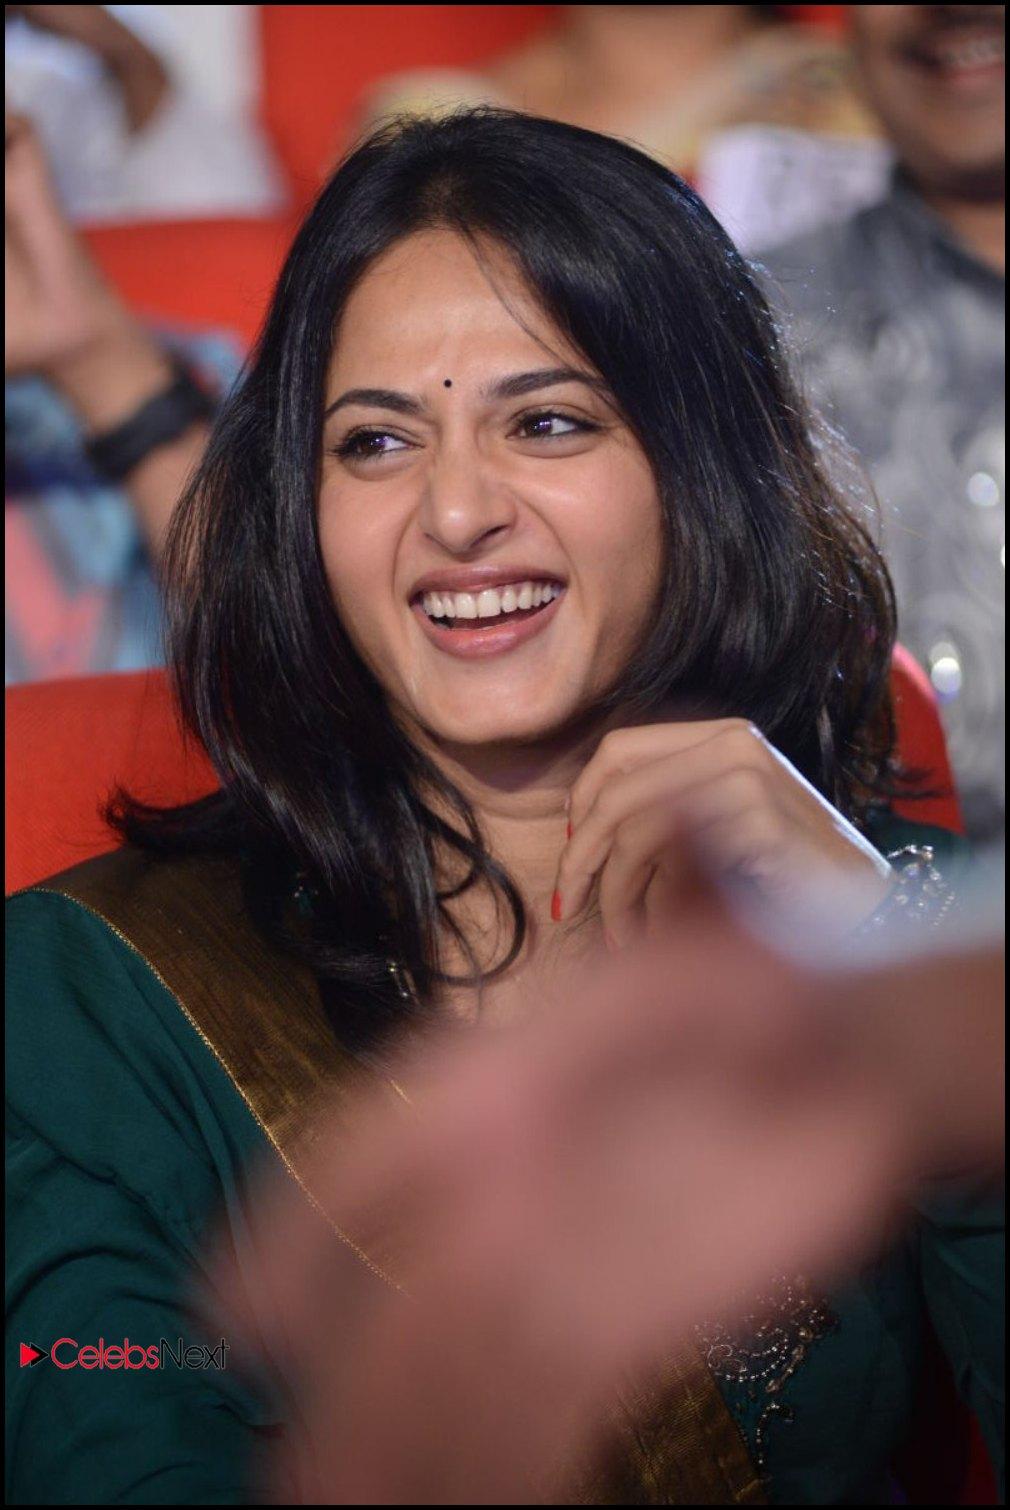 Anushka photos in salwar kameez at yamudu 2 singam 2 movie audio anushka shetty pictures in salwar kameez at yamudu 2 singam 2 movie audio launch thecheapjerseys Choice Image